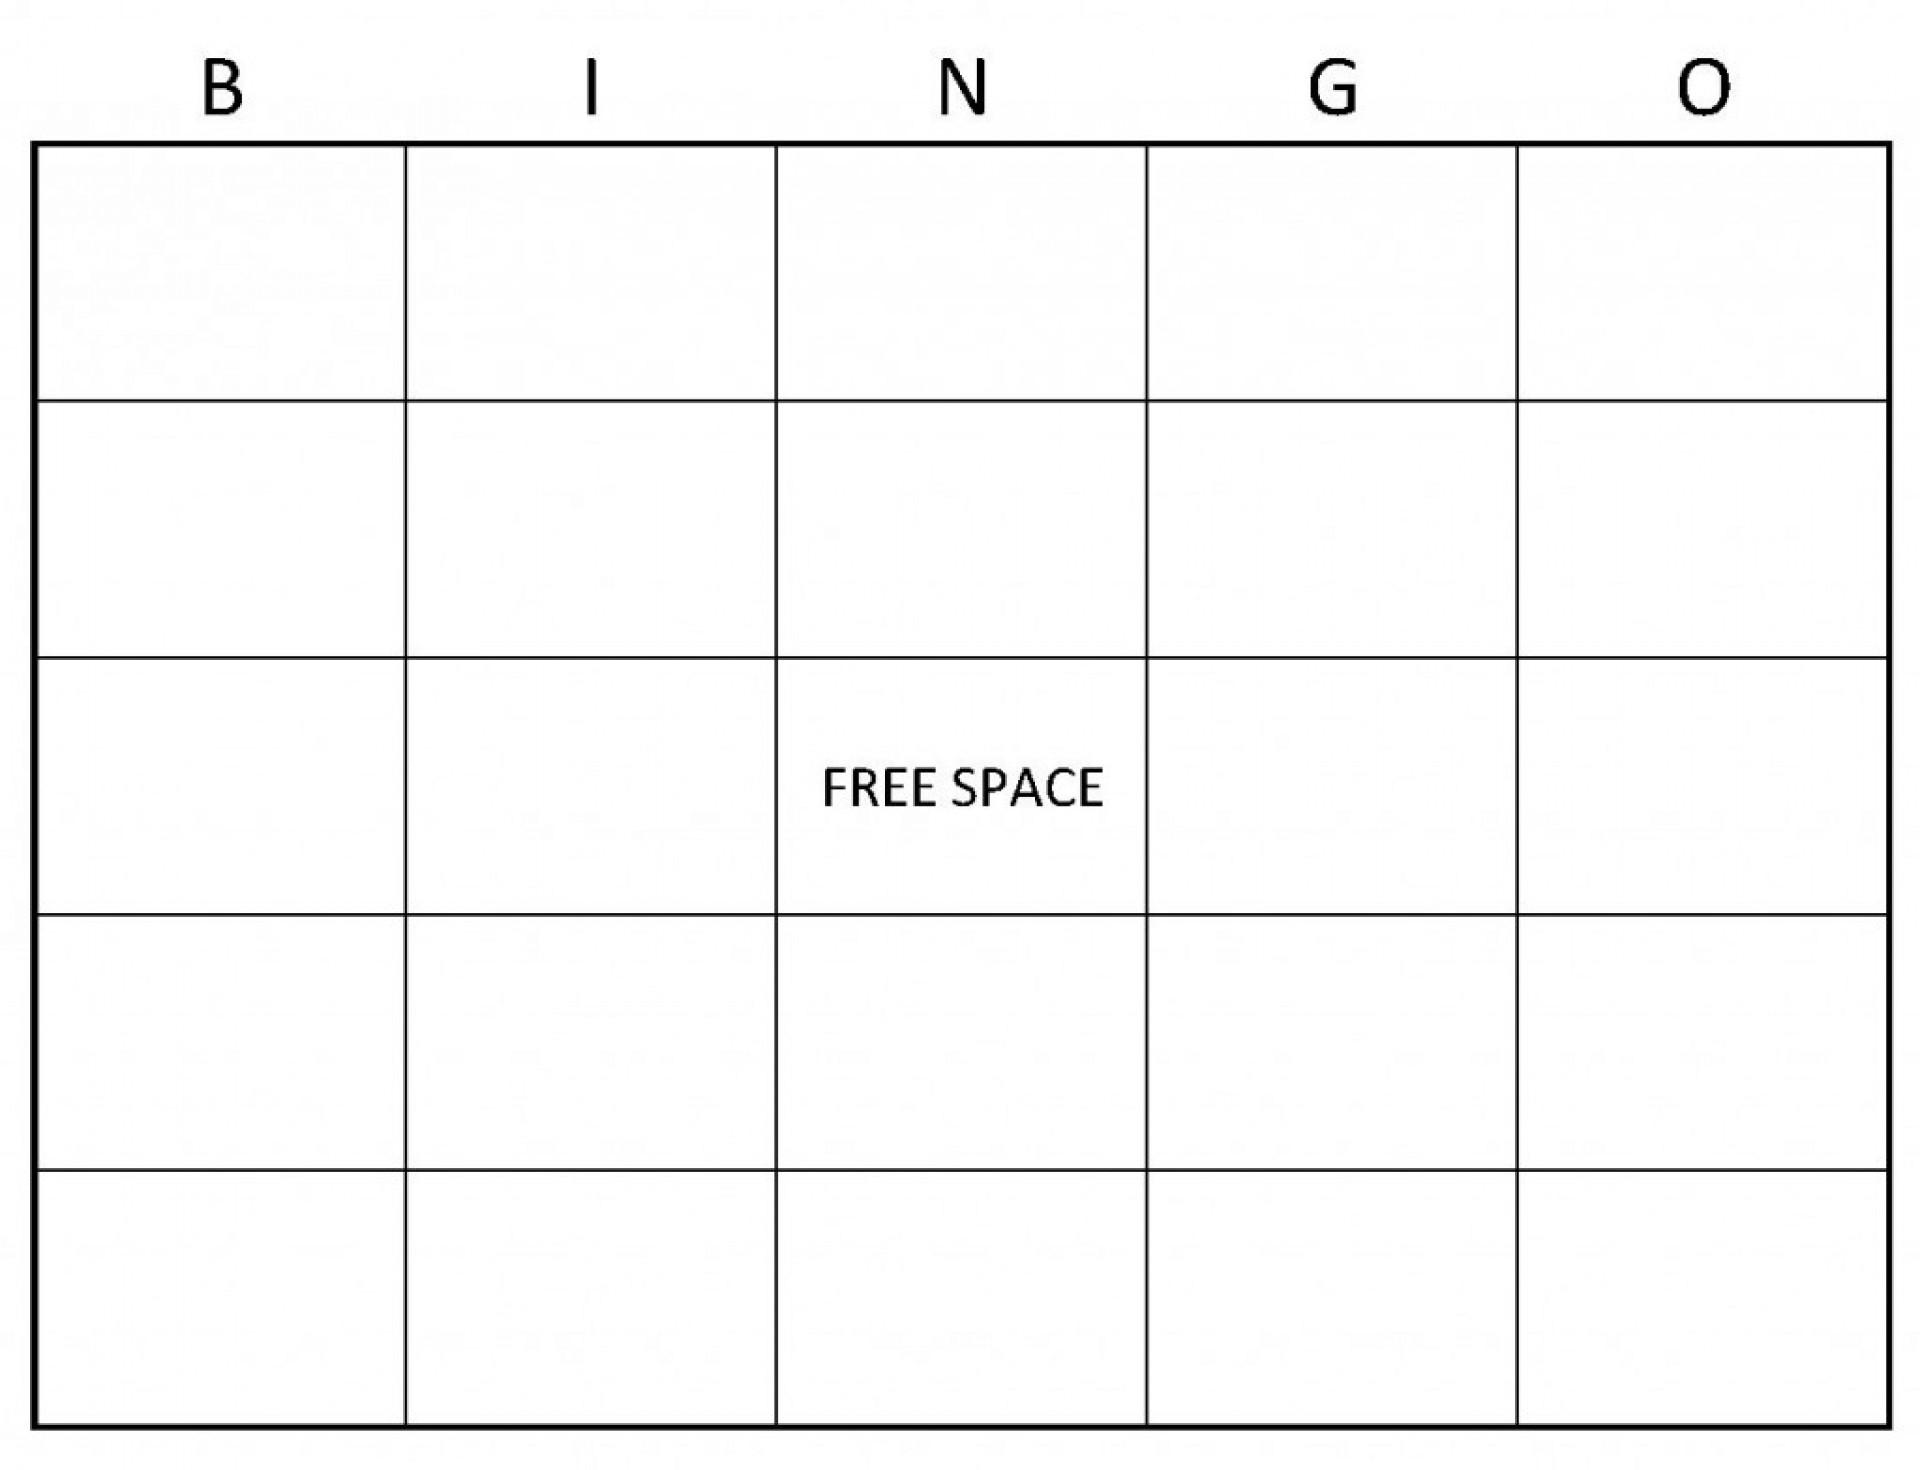 016 Template Ideas Blank Bingo Cards 1024X784 Card ~ Ulyssesroom - Free Printable Blank Bingo Cards